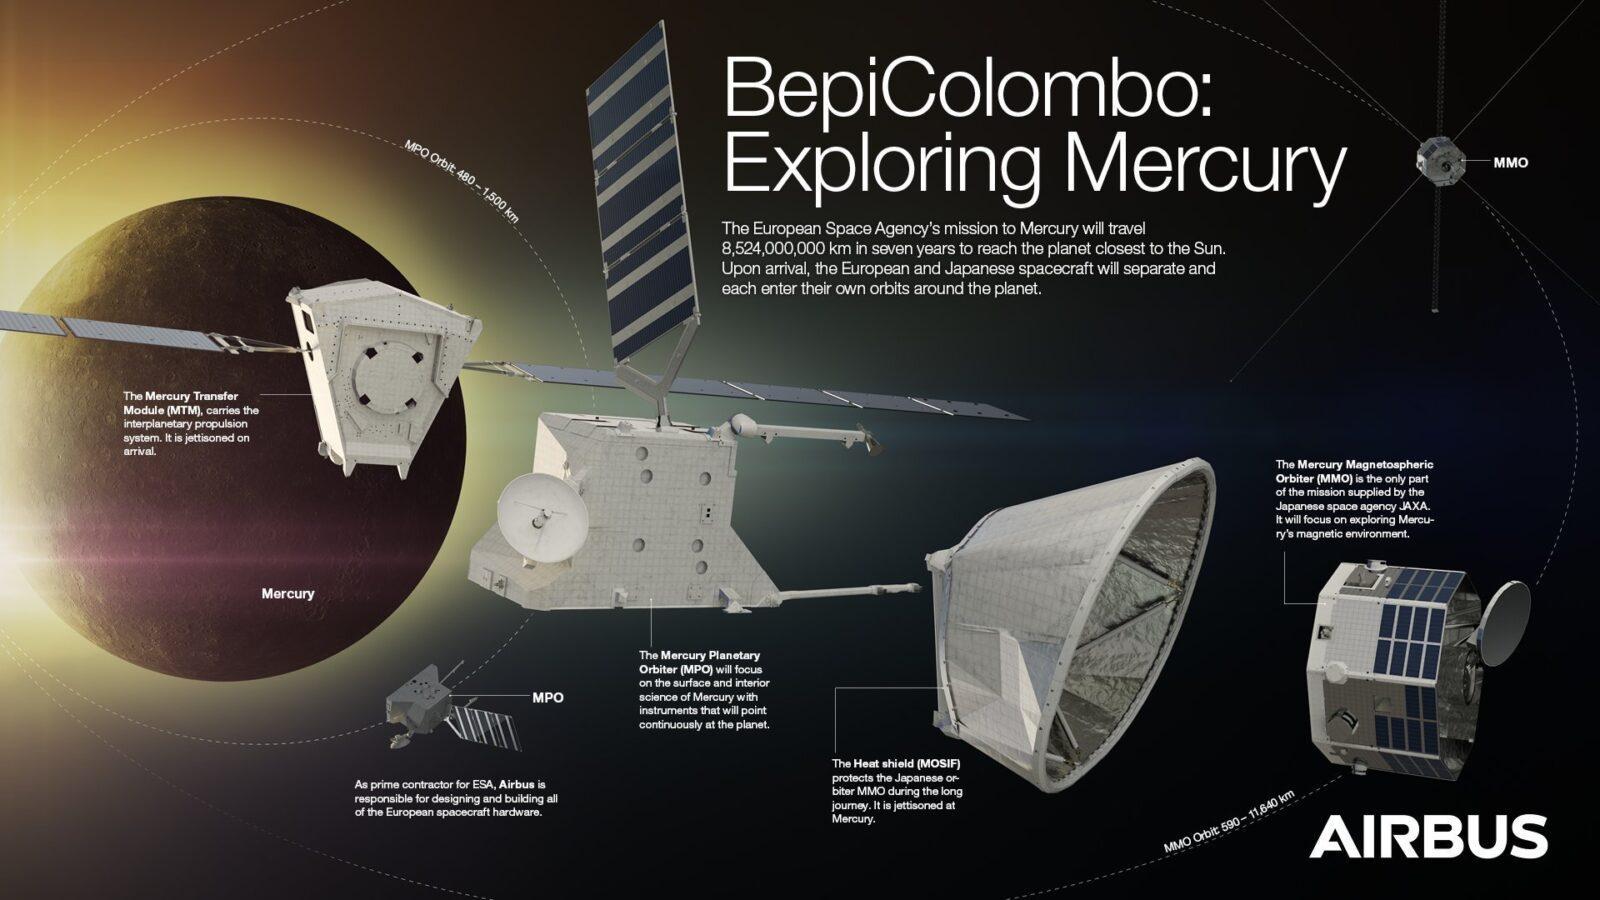 BepiColombo сделала первые снимки Меркурия (f674741935c9feff738e11197be6096b 1)